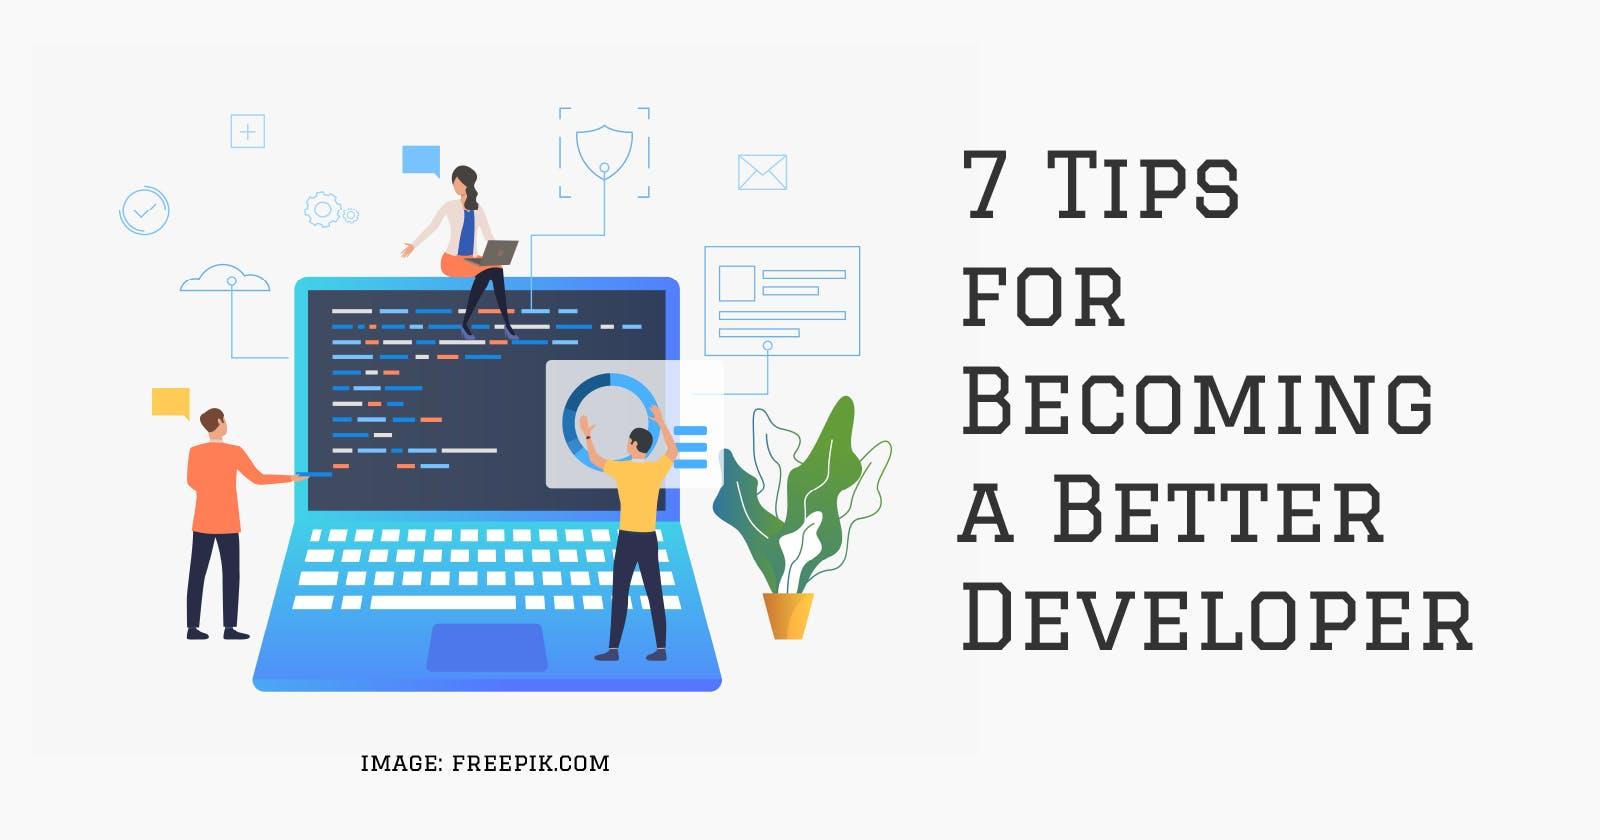 7 Tips for Becoming a Better Developer